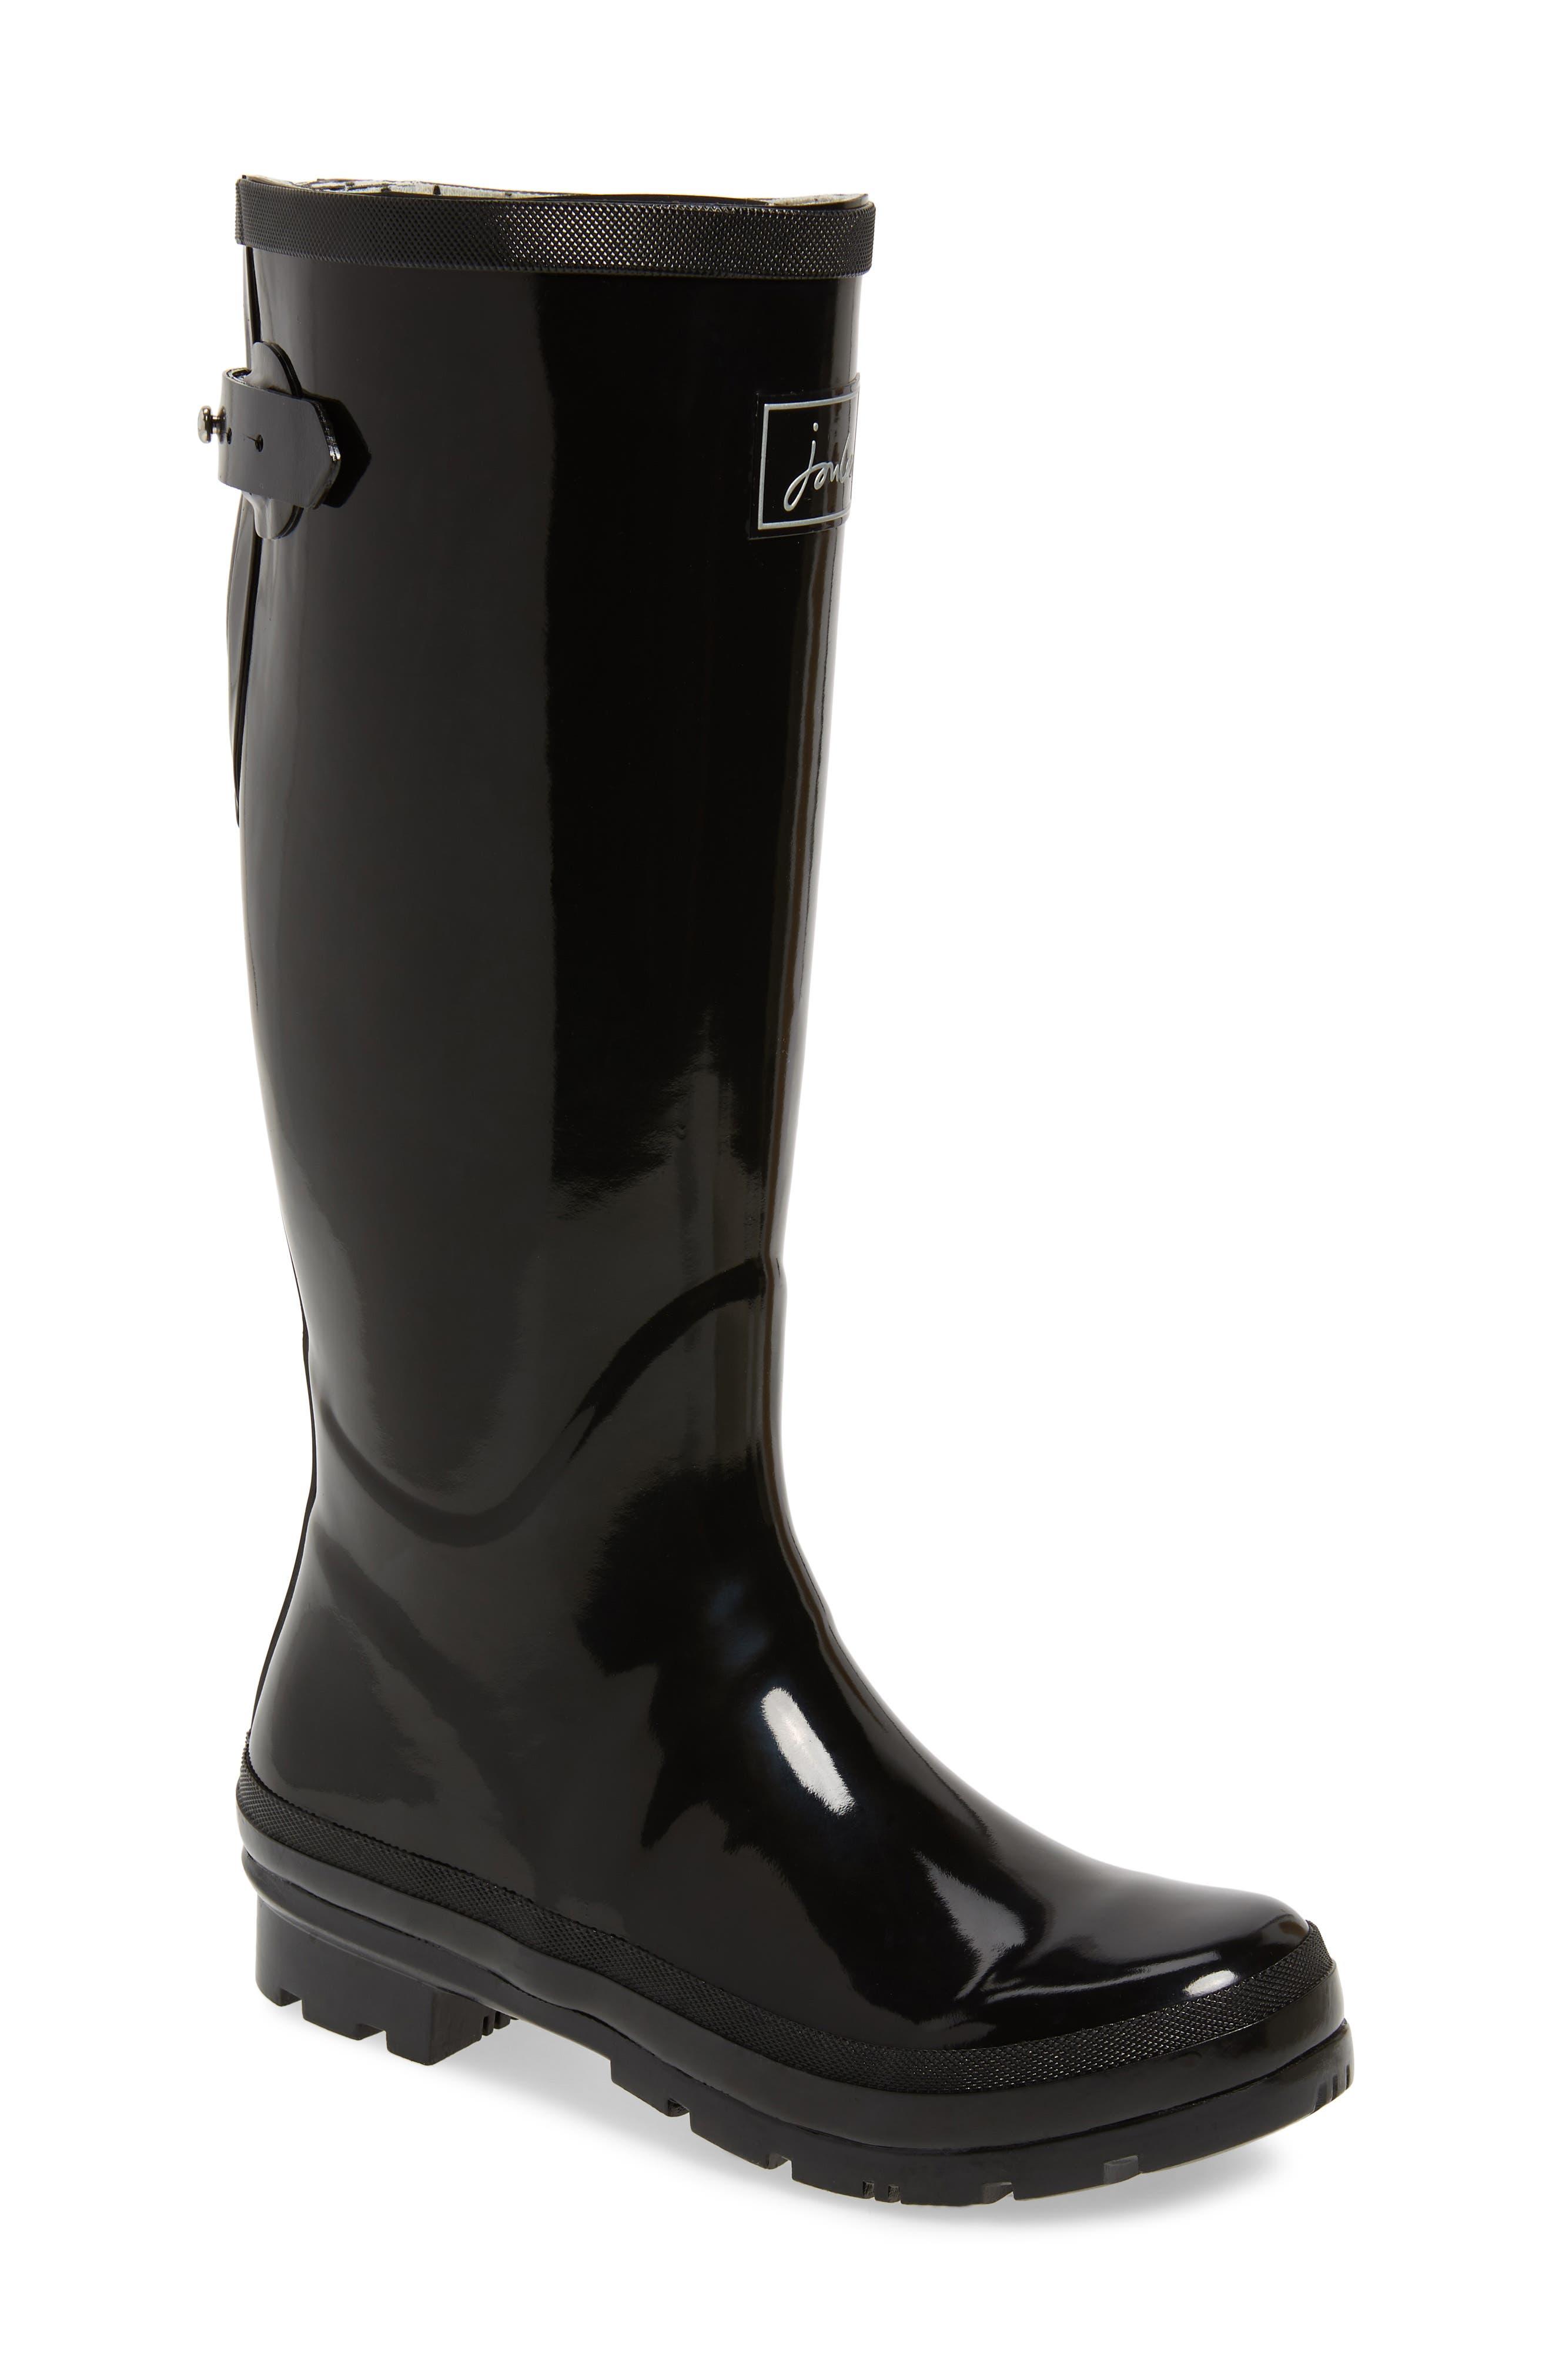 Joules Tall Welly Waterproof Rain Boot, Black